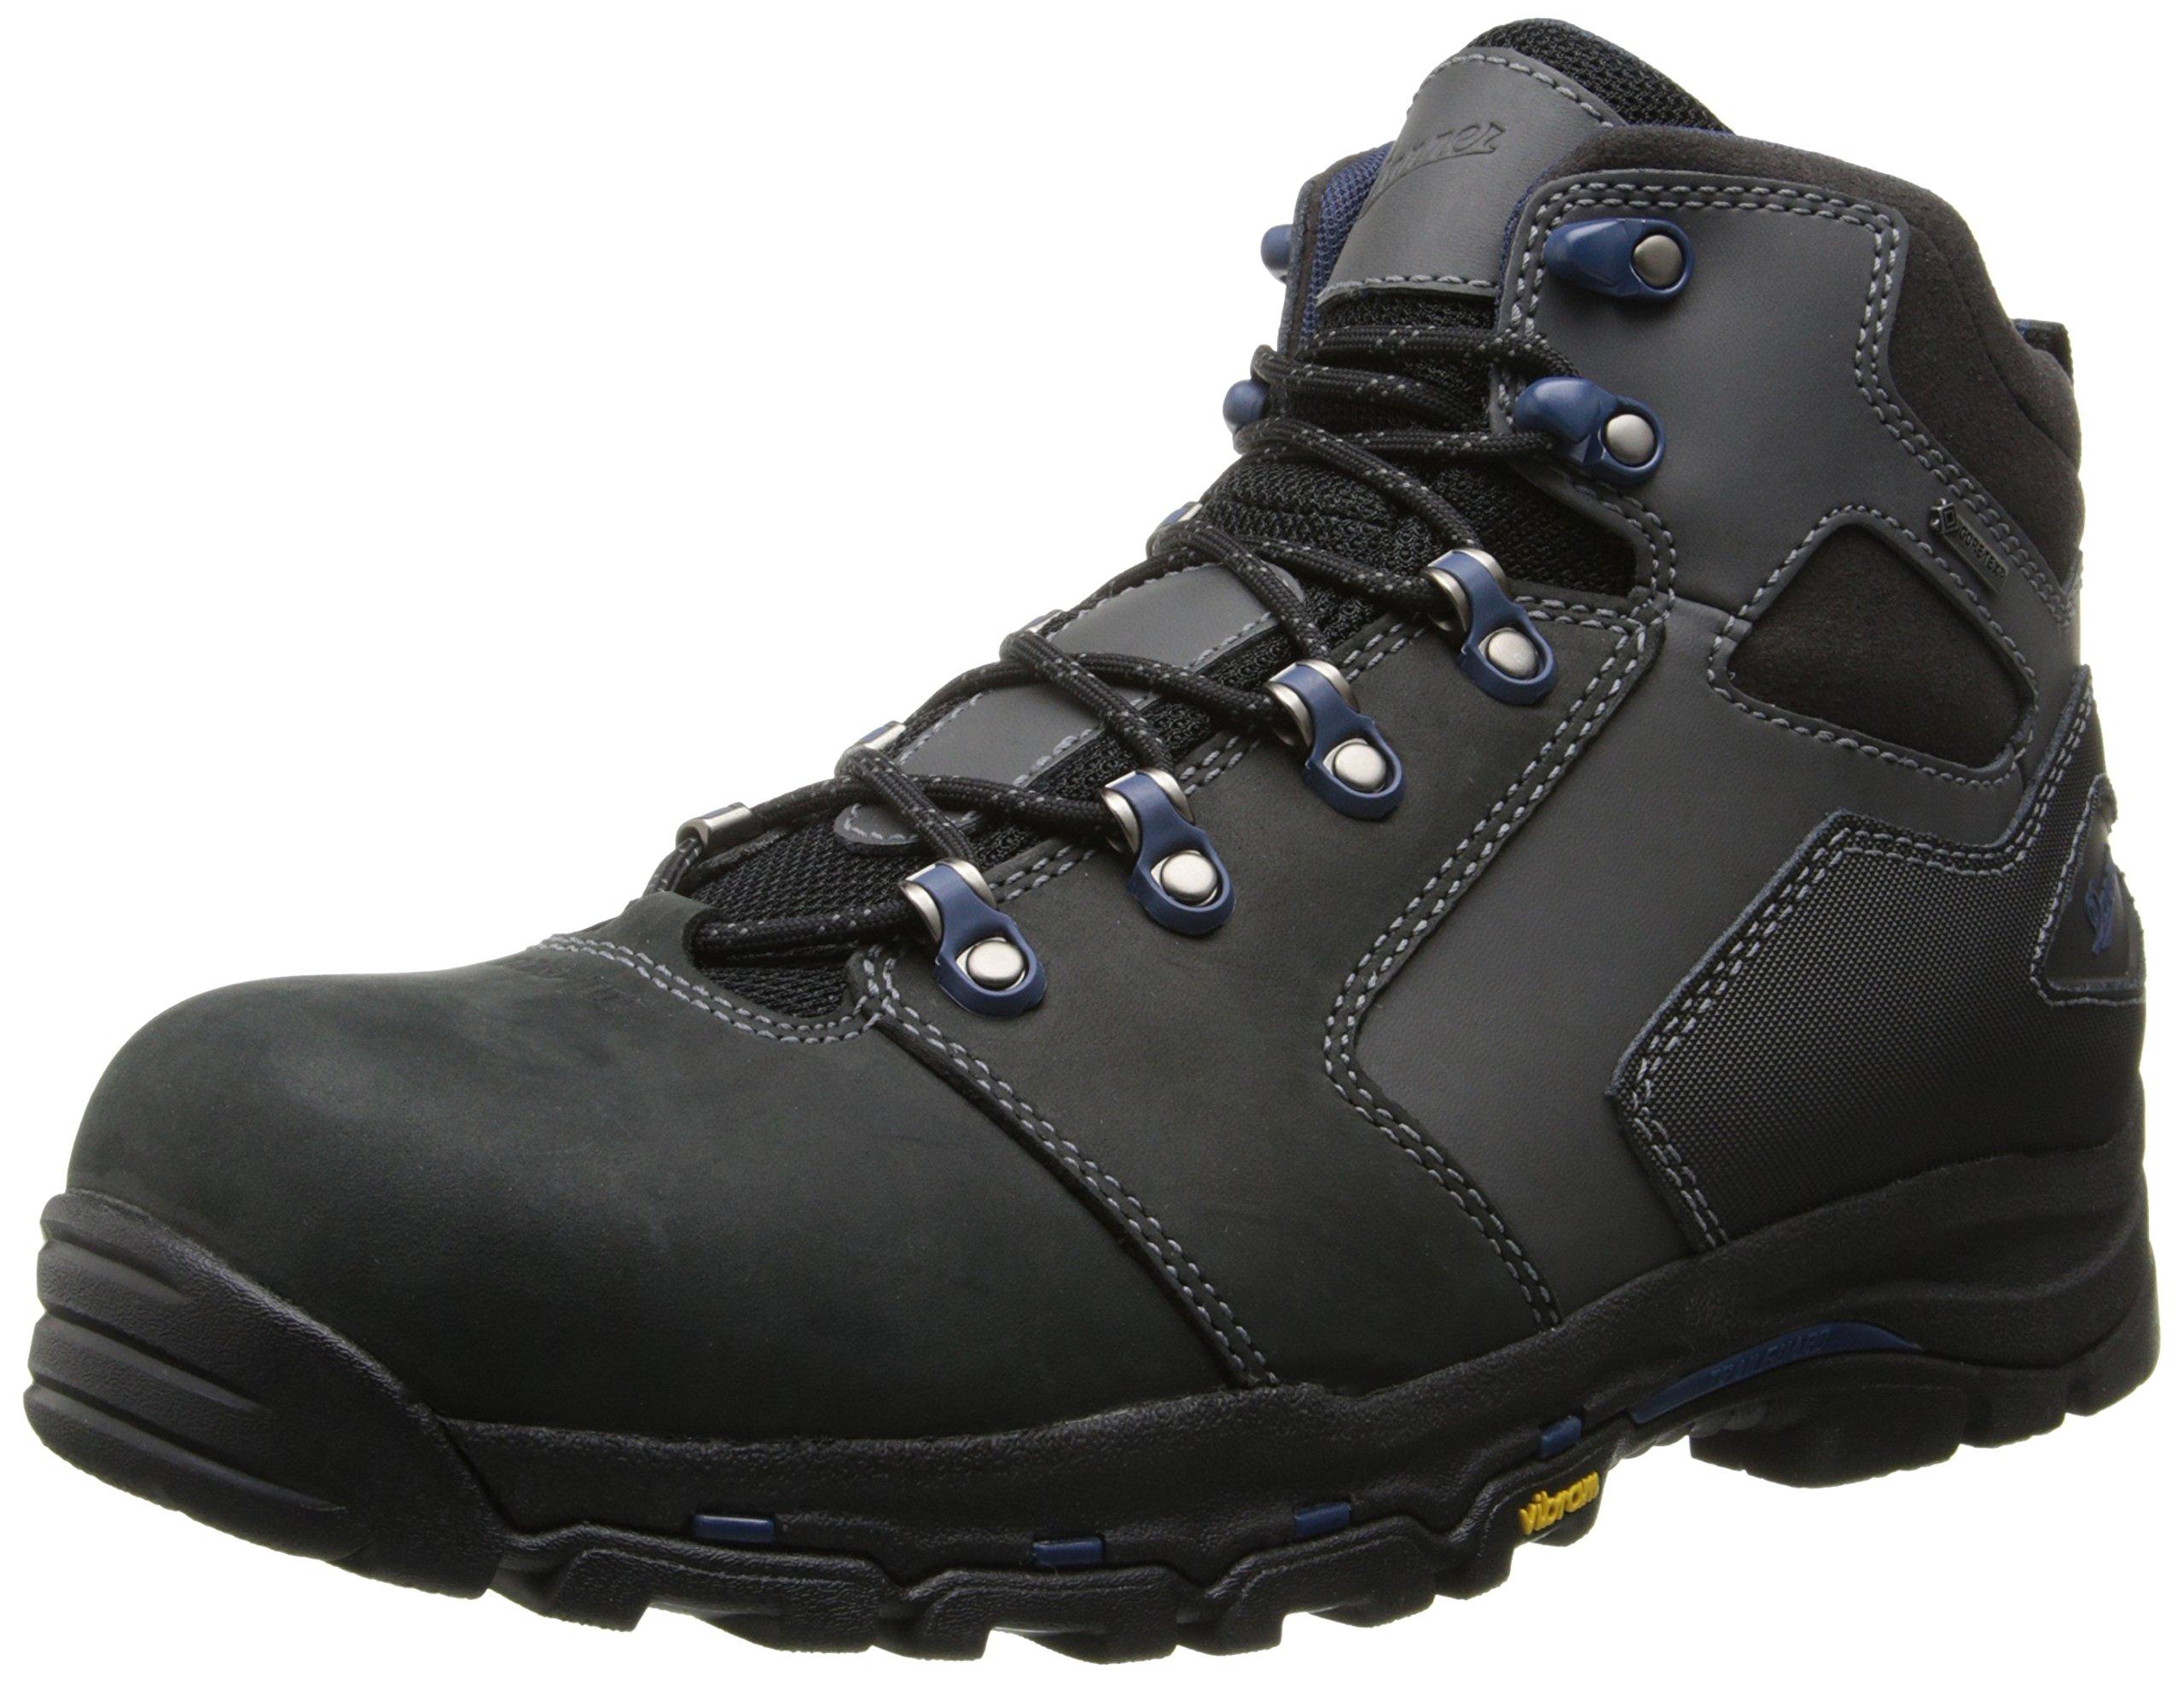 Danner Men's Vicious 4.5 Inch NMT Work Boot